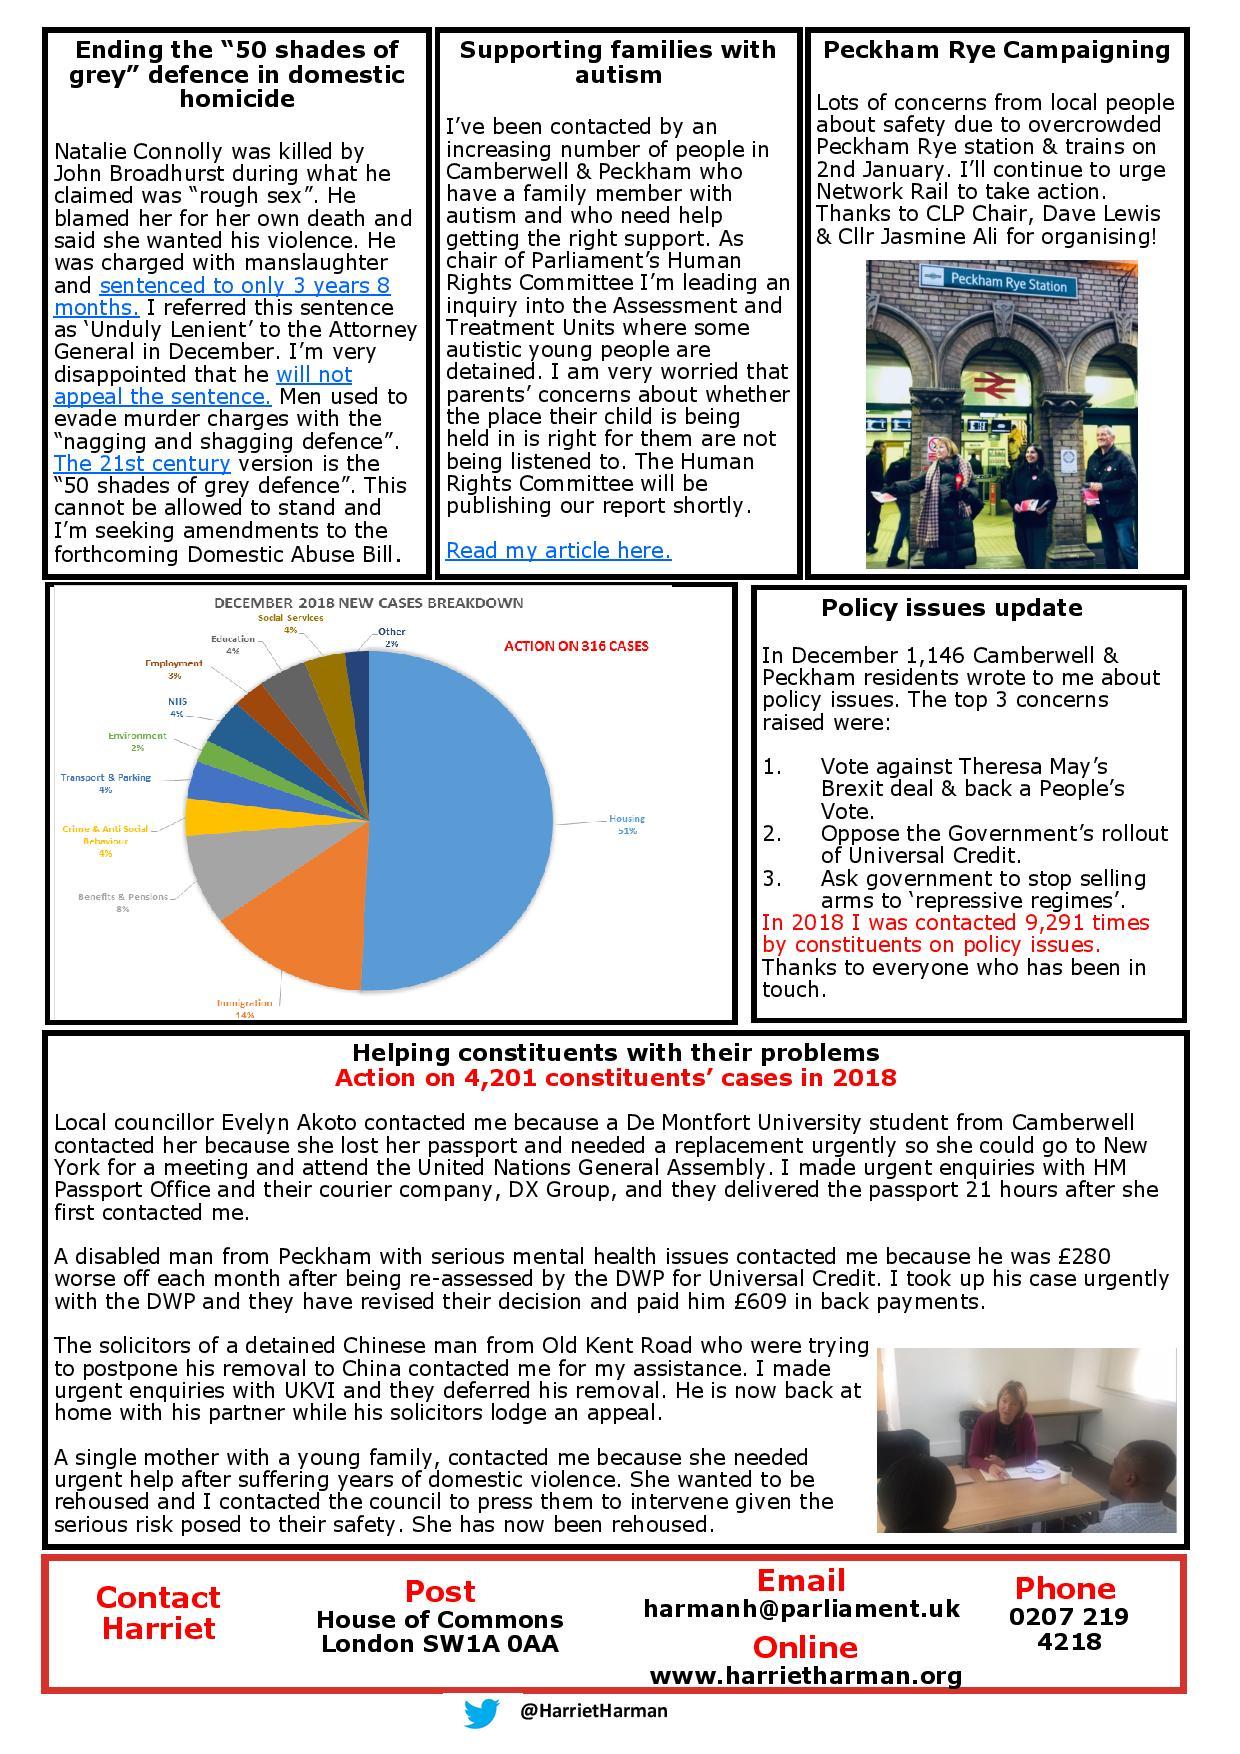 GC_Report_Dec_Jan_2019-page-002.jpg